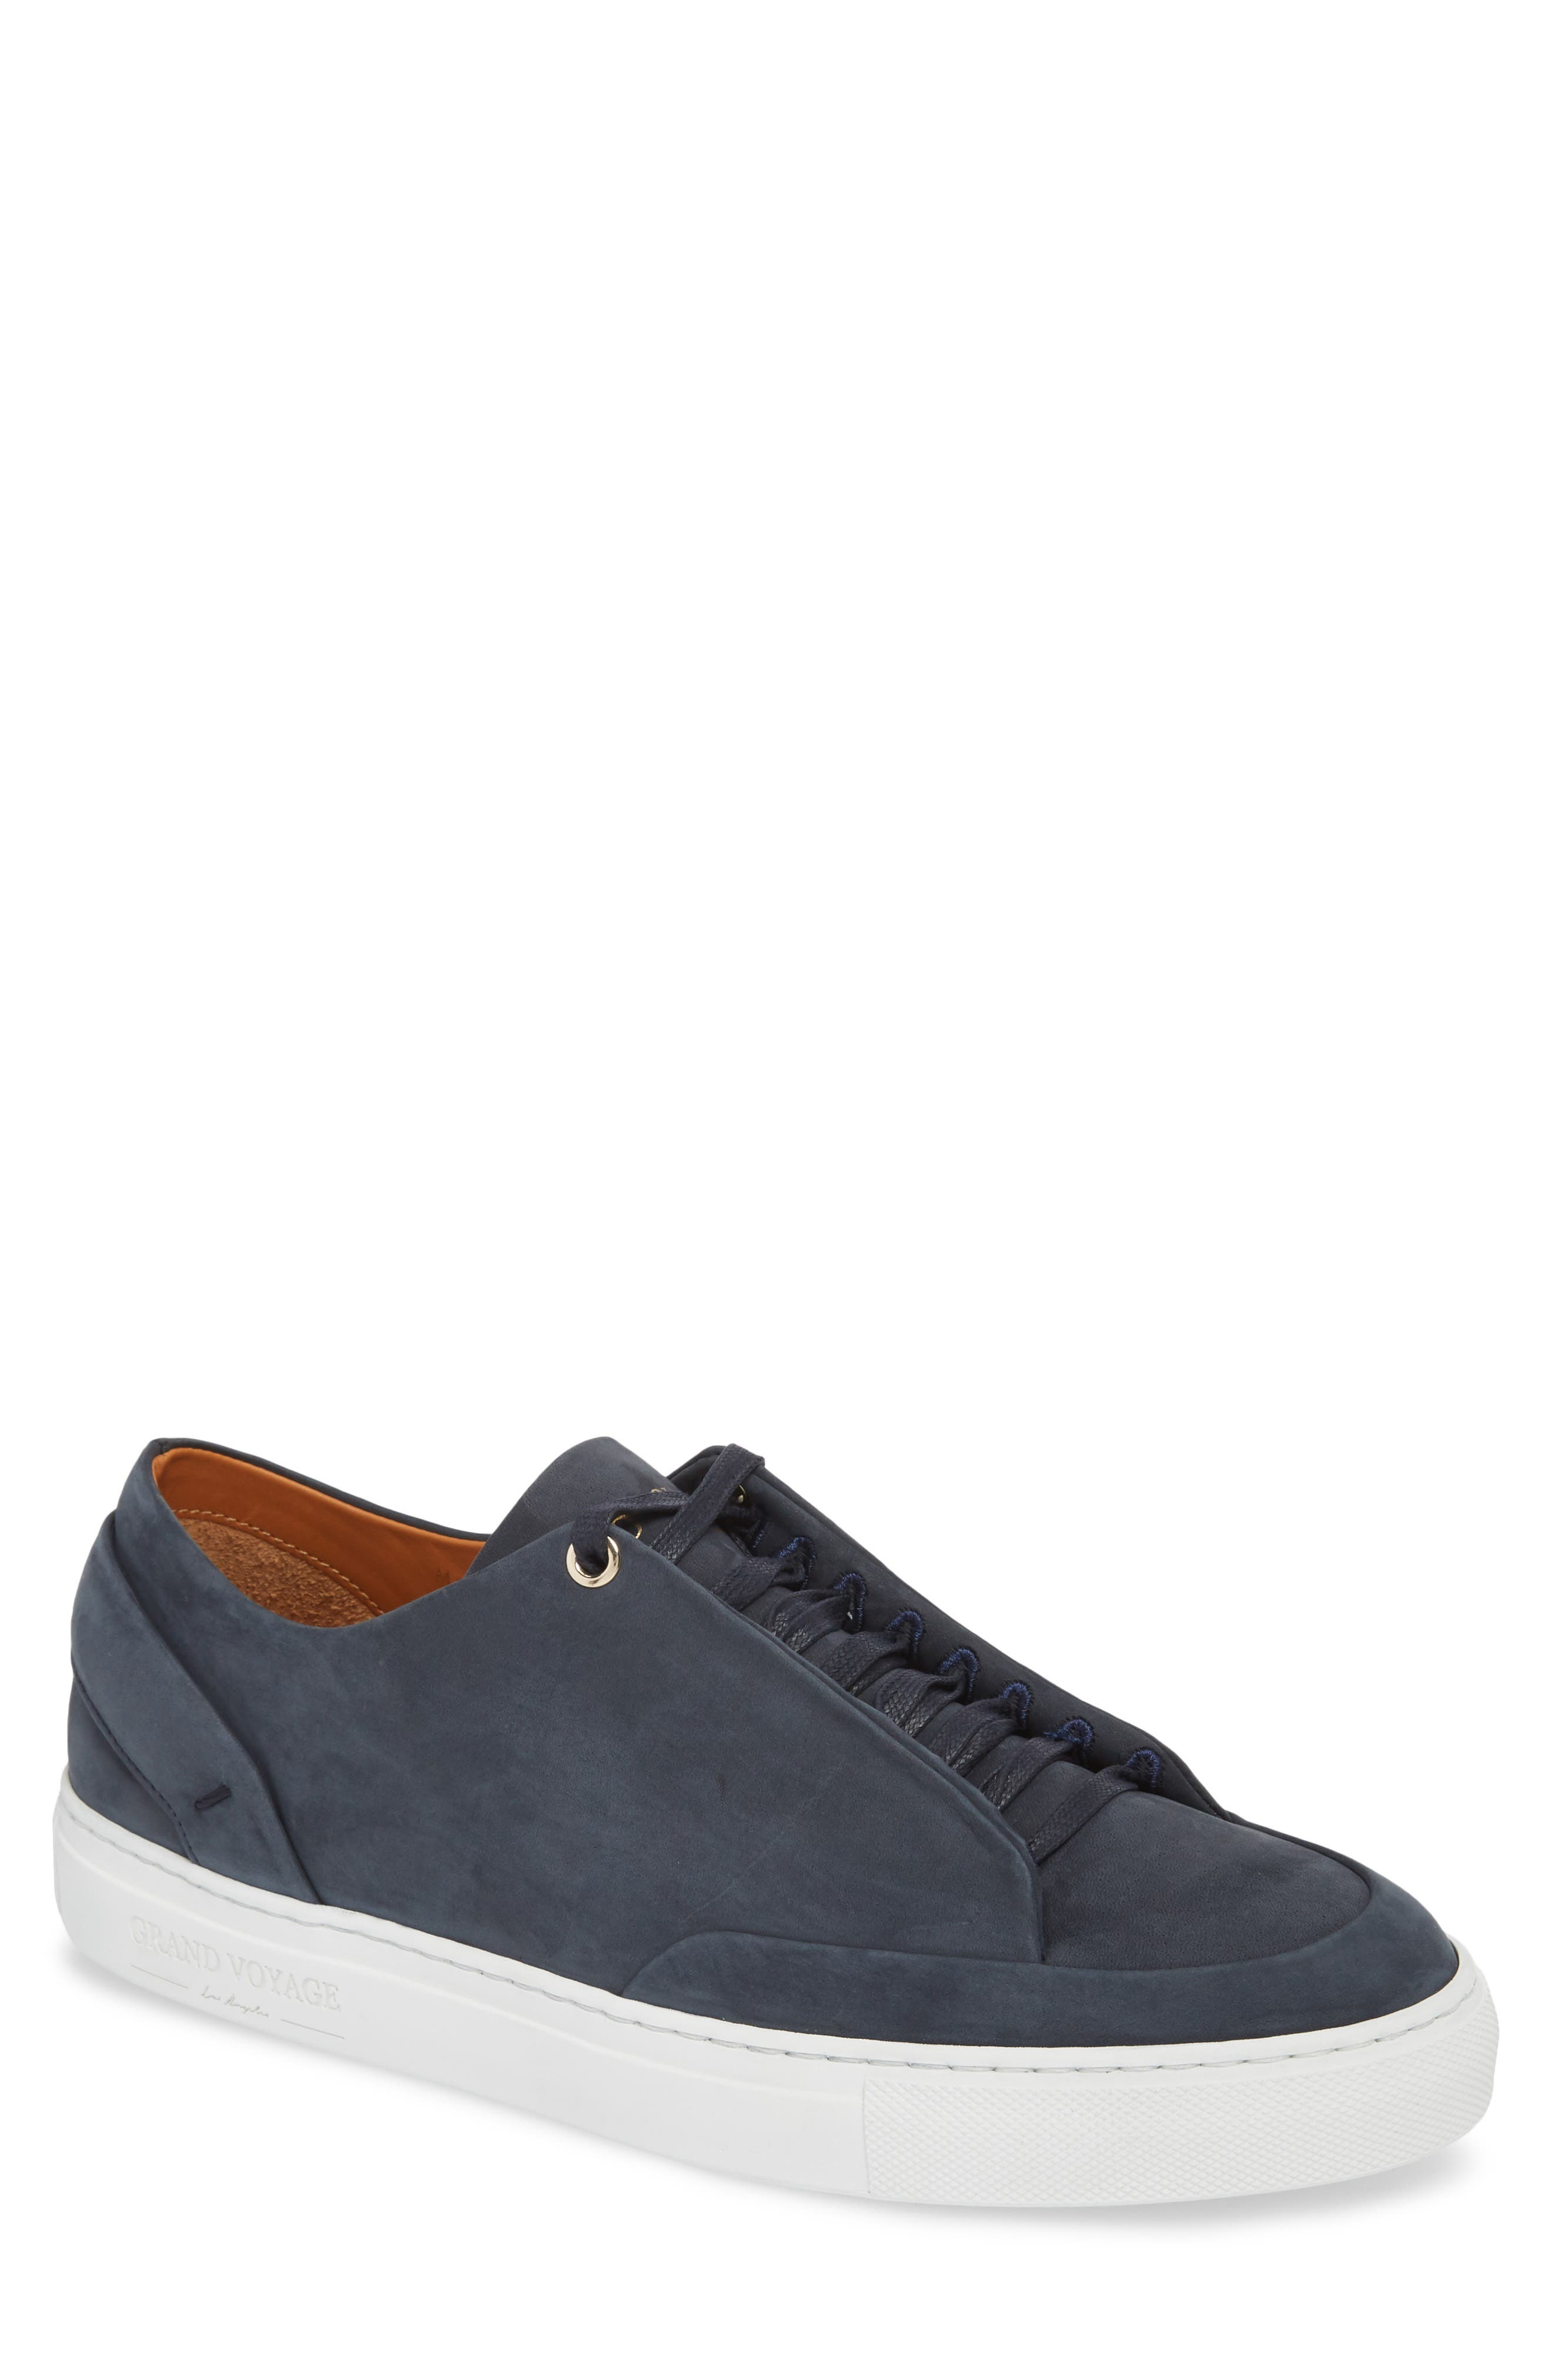 Avedon Sneaker,                             Main thumbnail 1, color,                             Navy Nubuck Leather